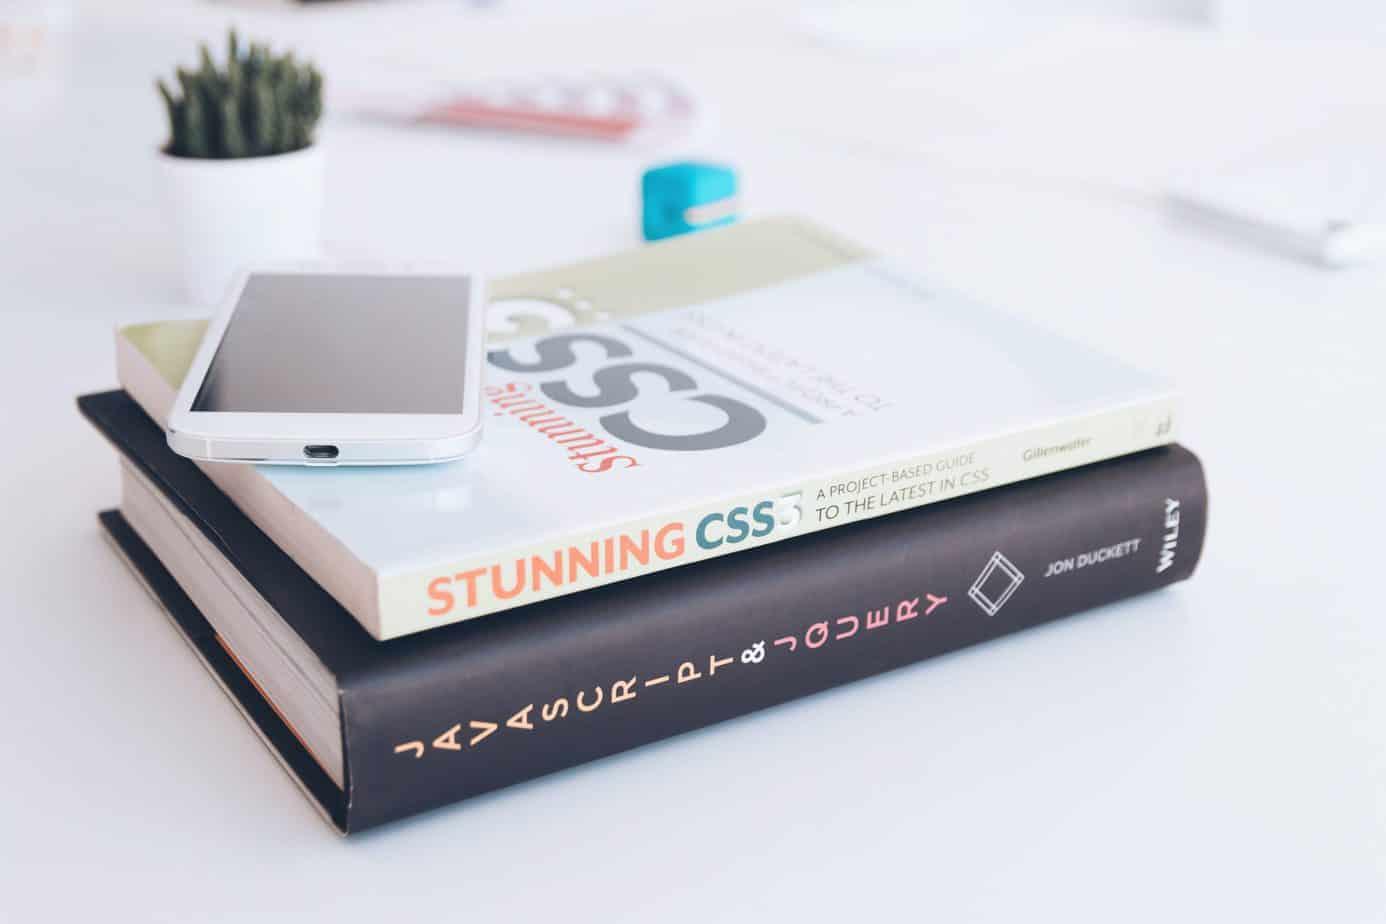 Libros sobre buenas prácticas en programación. Lenguaje de programación. | Clean code. Libros sobre buenas prácticas en programación | Professional JavaScript for Web Developers. Lenguaje de programación | The Pragmatic Programmer. Libros sobre buenas prácticas en programación